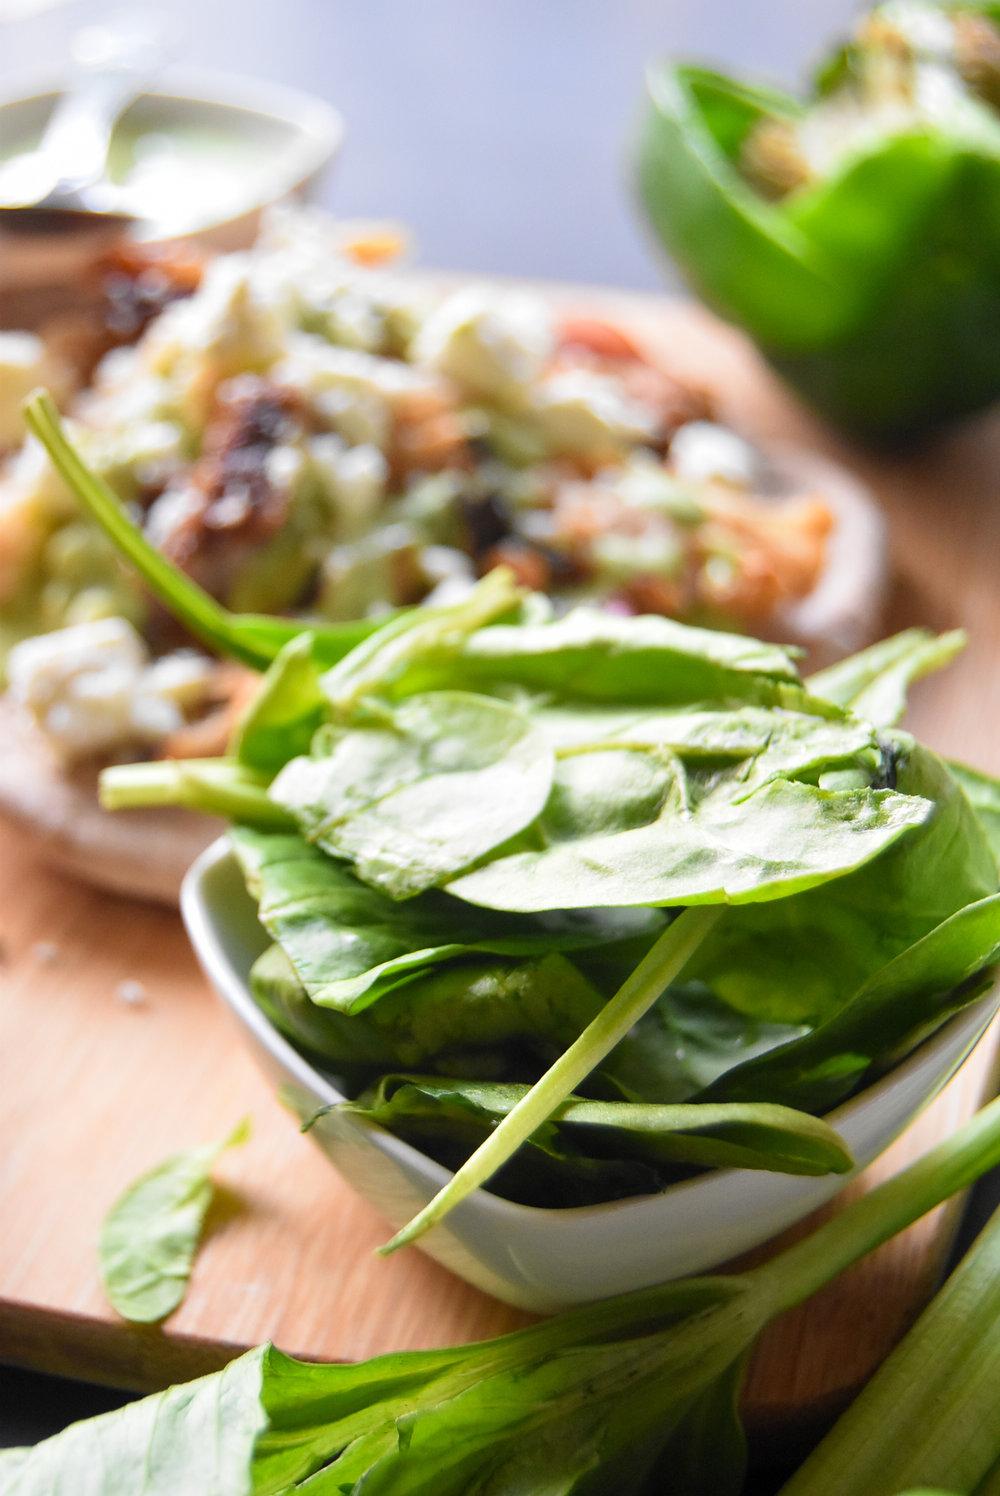 Cauliflower Shawarma Wraps with Green Tahini and Feta 1.jpg